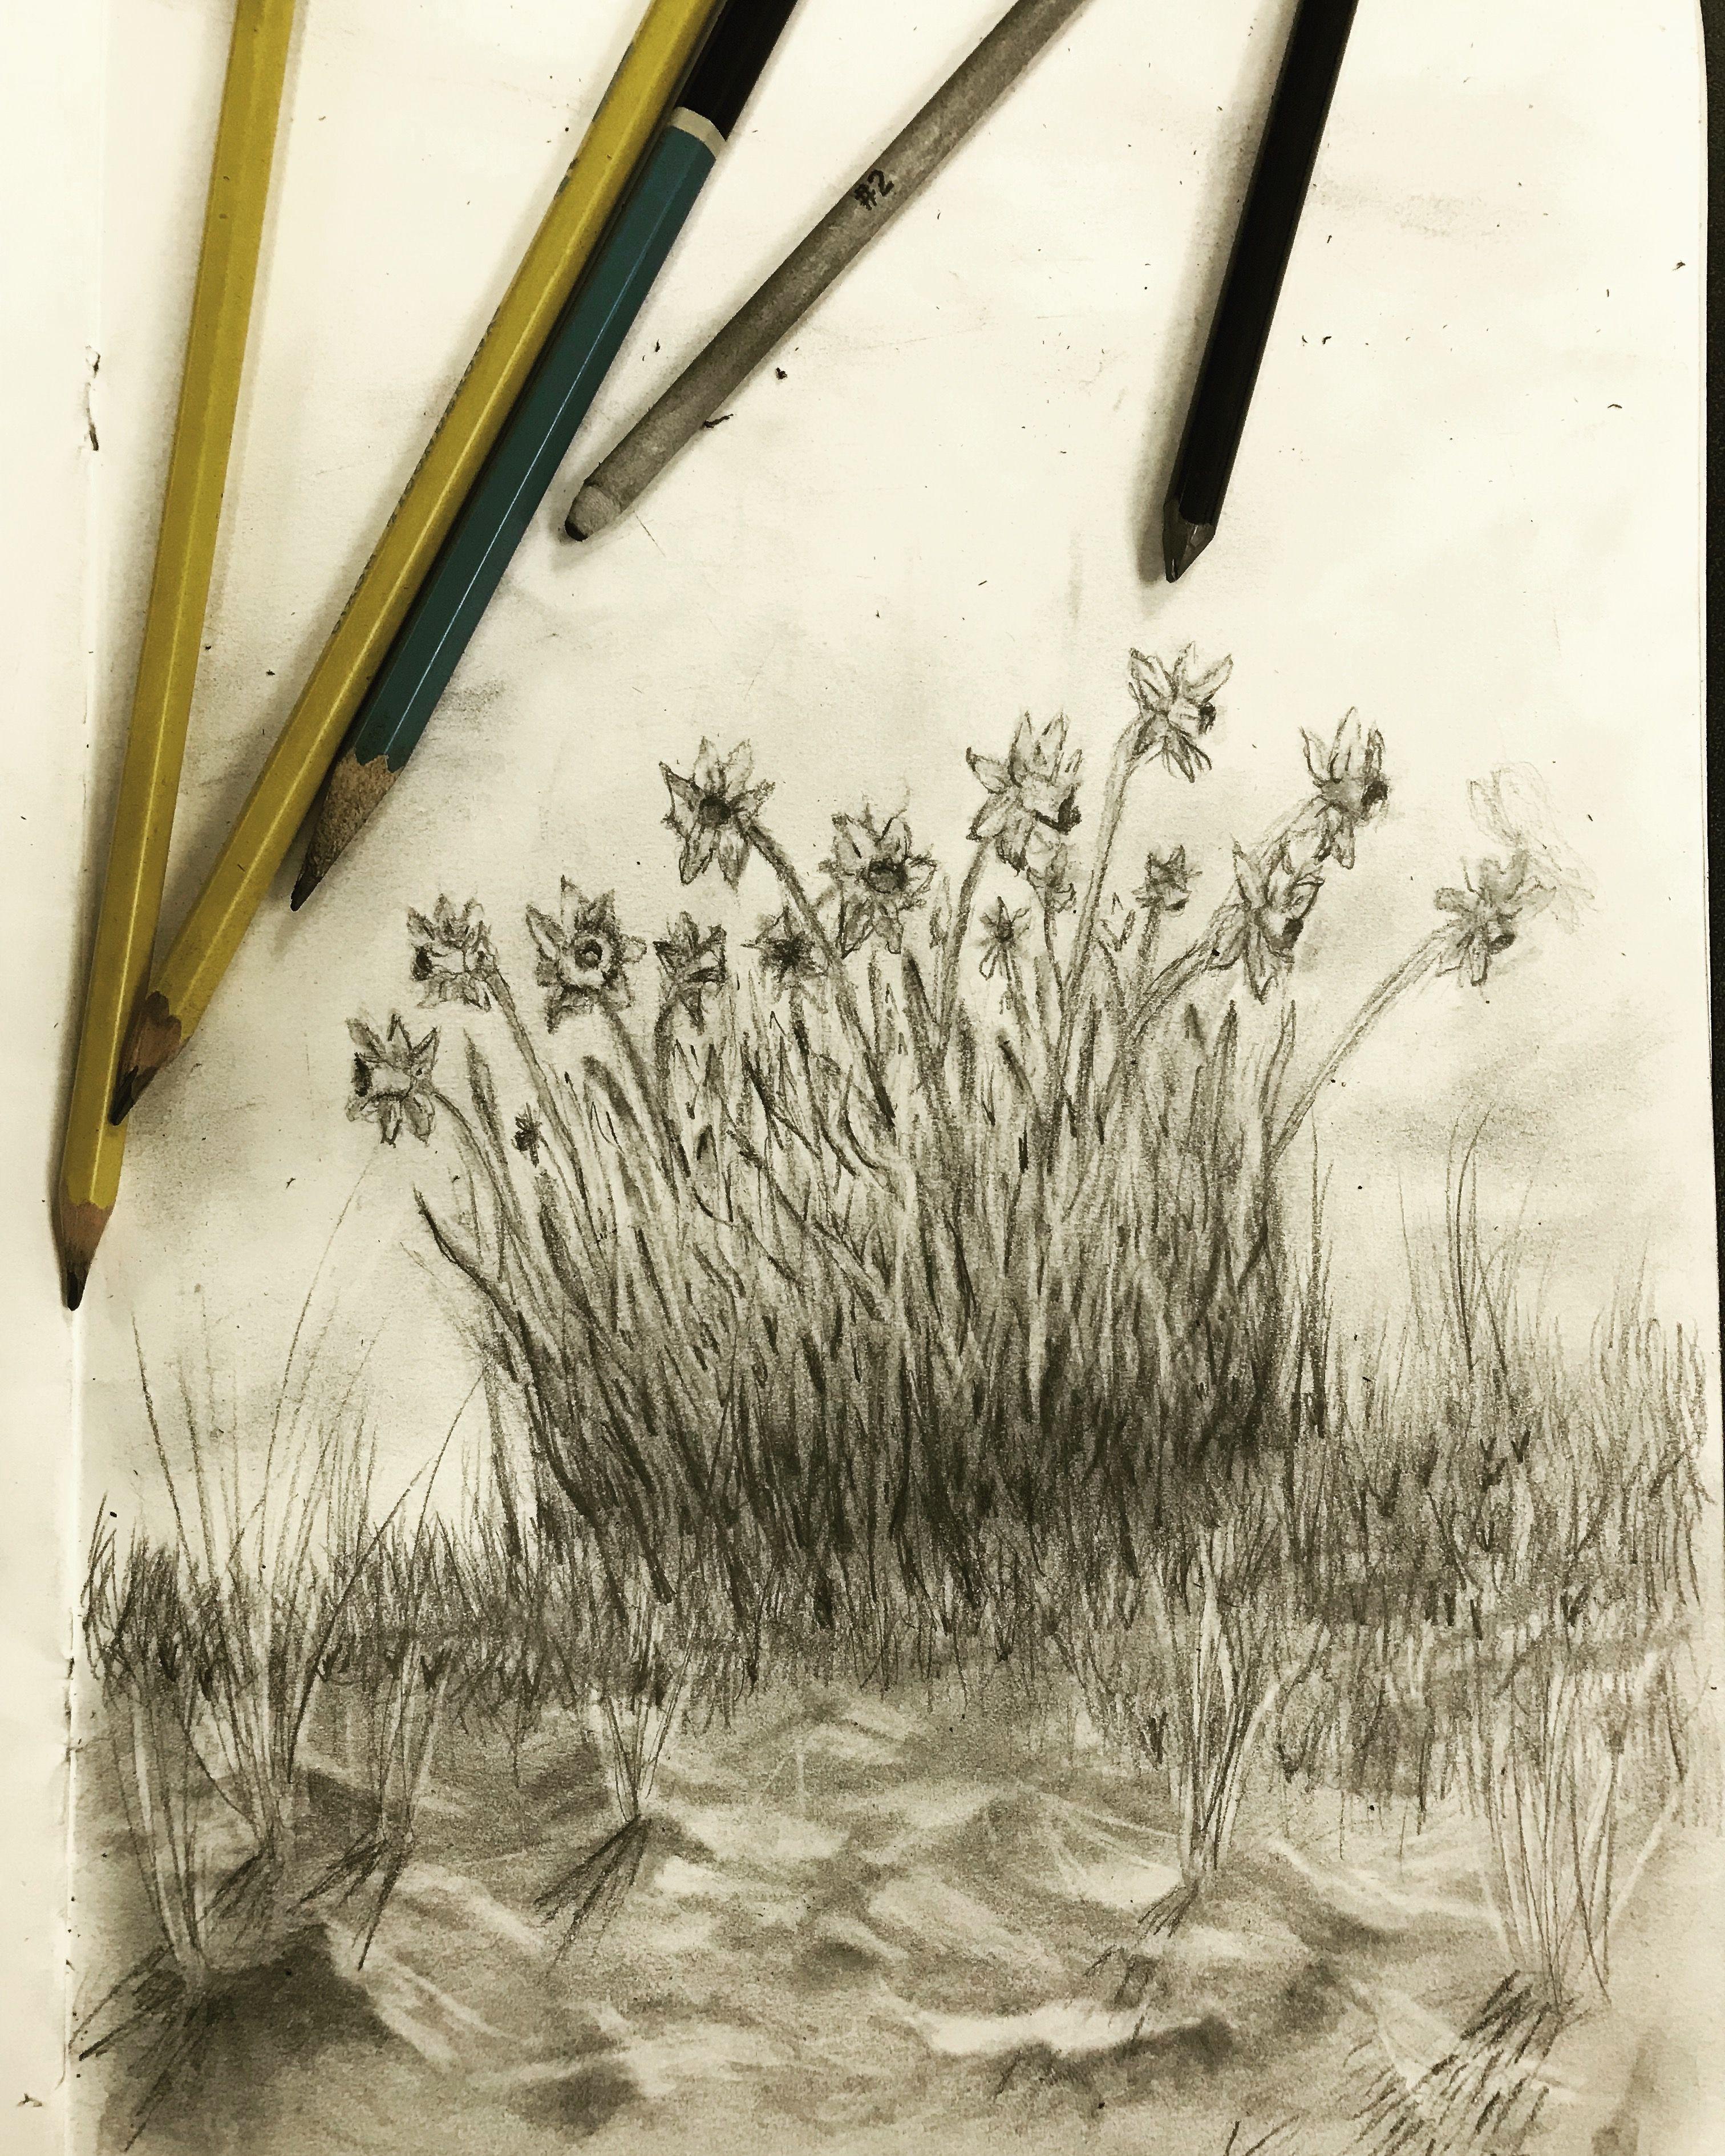 Daffodil drawing my artwork pinterest daffodils and artwork